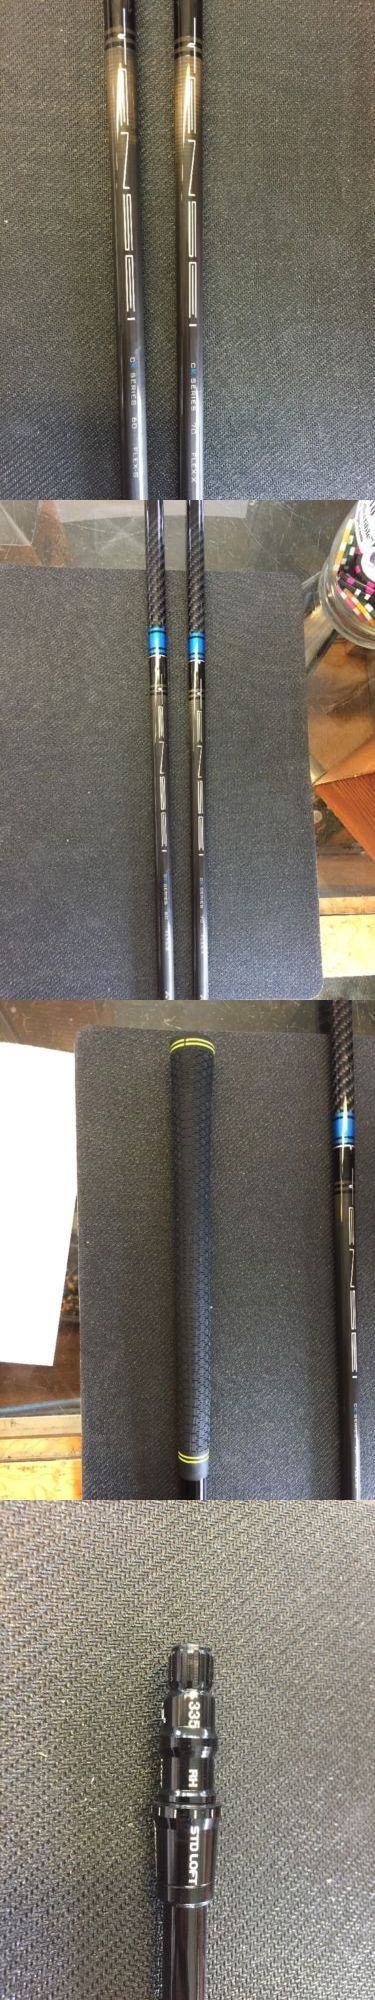 Golf Club Shafts 47326: New 2017 Taylormade M1 M2 Driver Shaft Tensei Ck X-Flex Rh Extra Stiff -> BUY IT NOW ONLY: $99.89 on eBay!